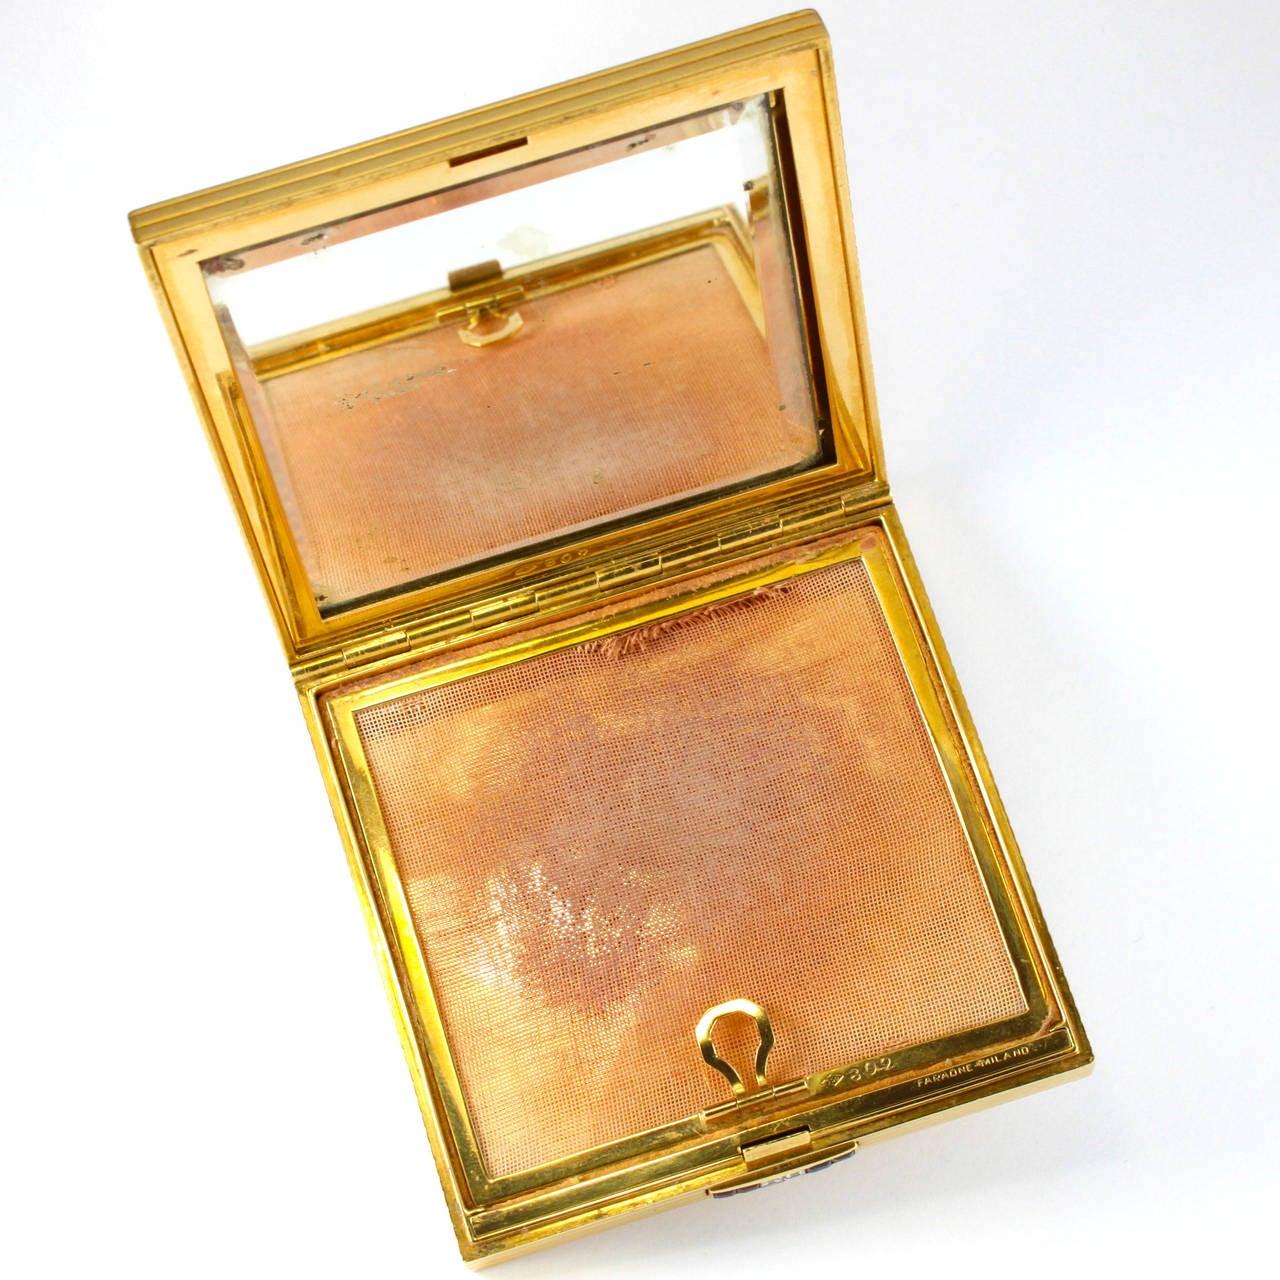 1950s Faraone Ruby Sapphire Diamond 18 Karat Gold Compact In Good Condition For Sale In Idar-Oberstein, DE